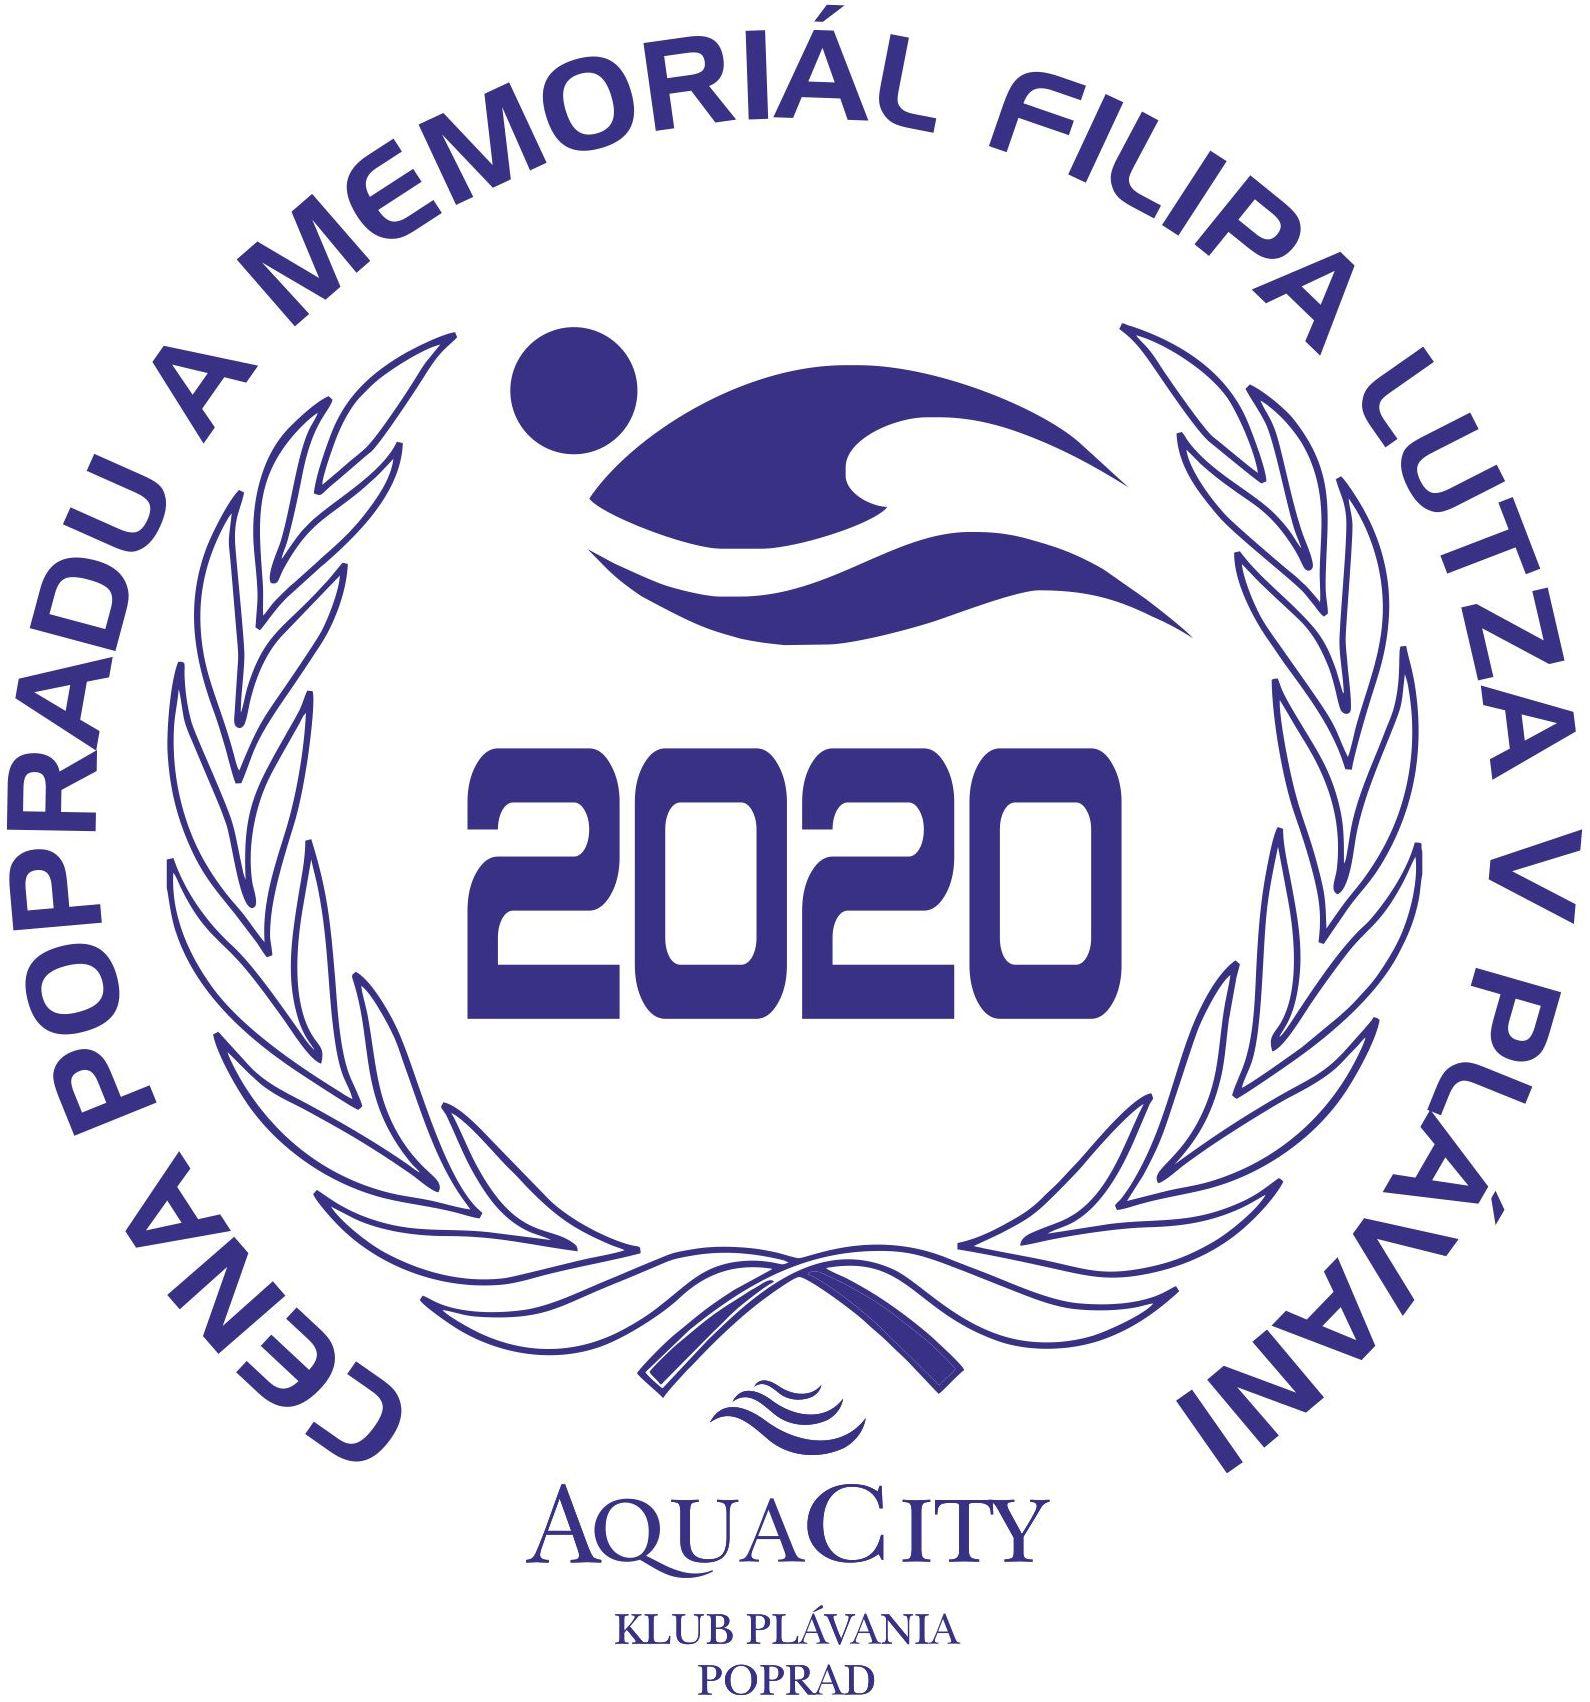 Cena Popradu 2020 - logo